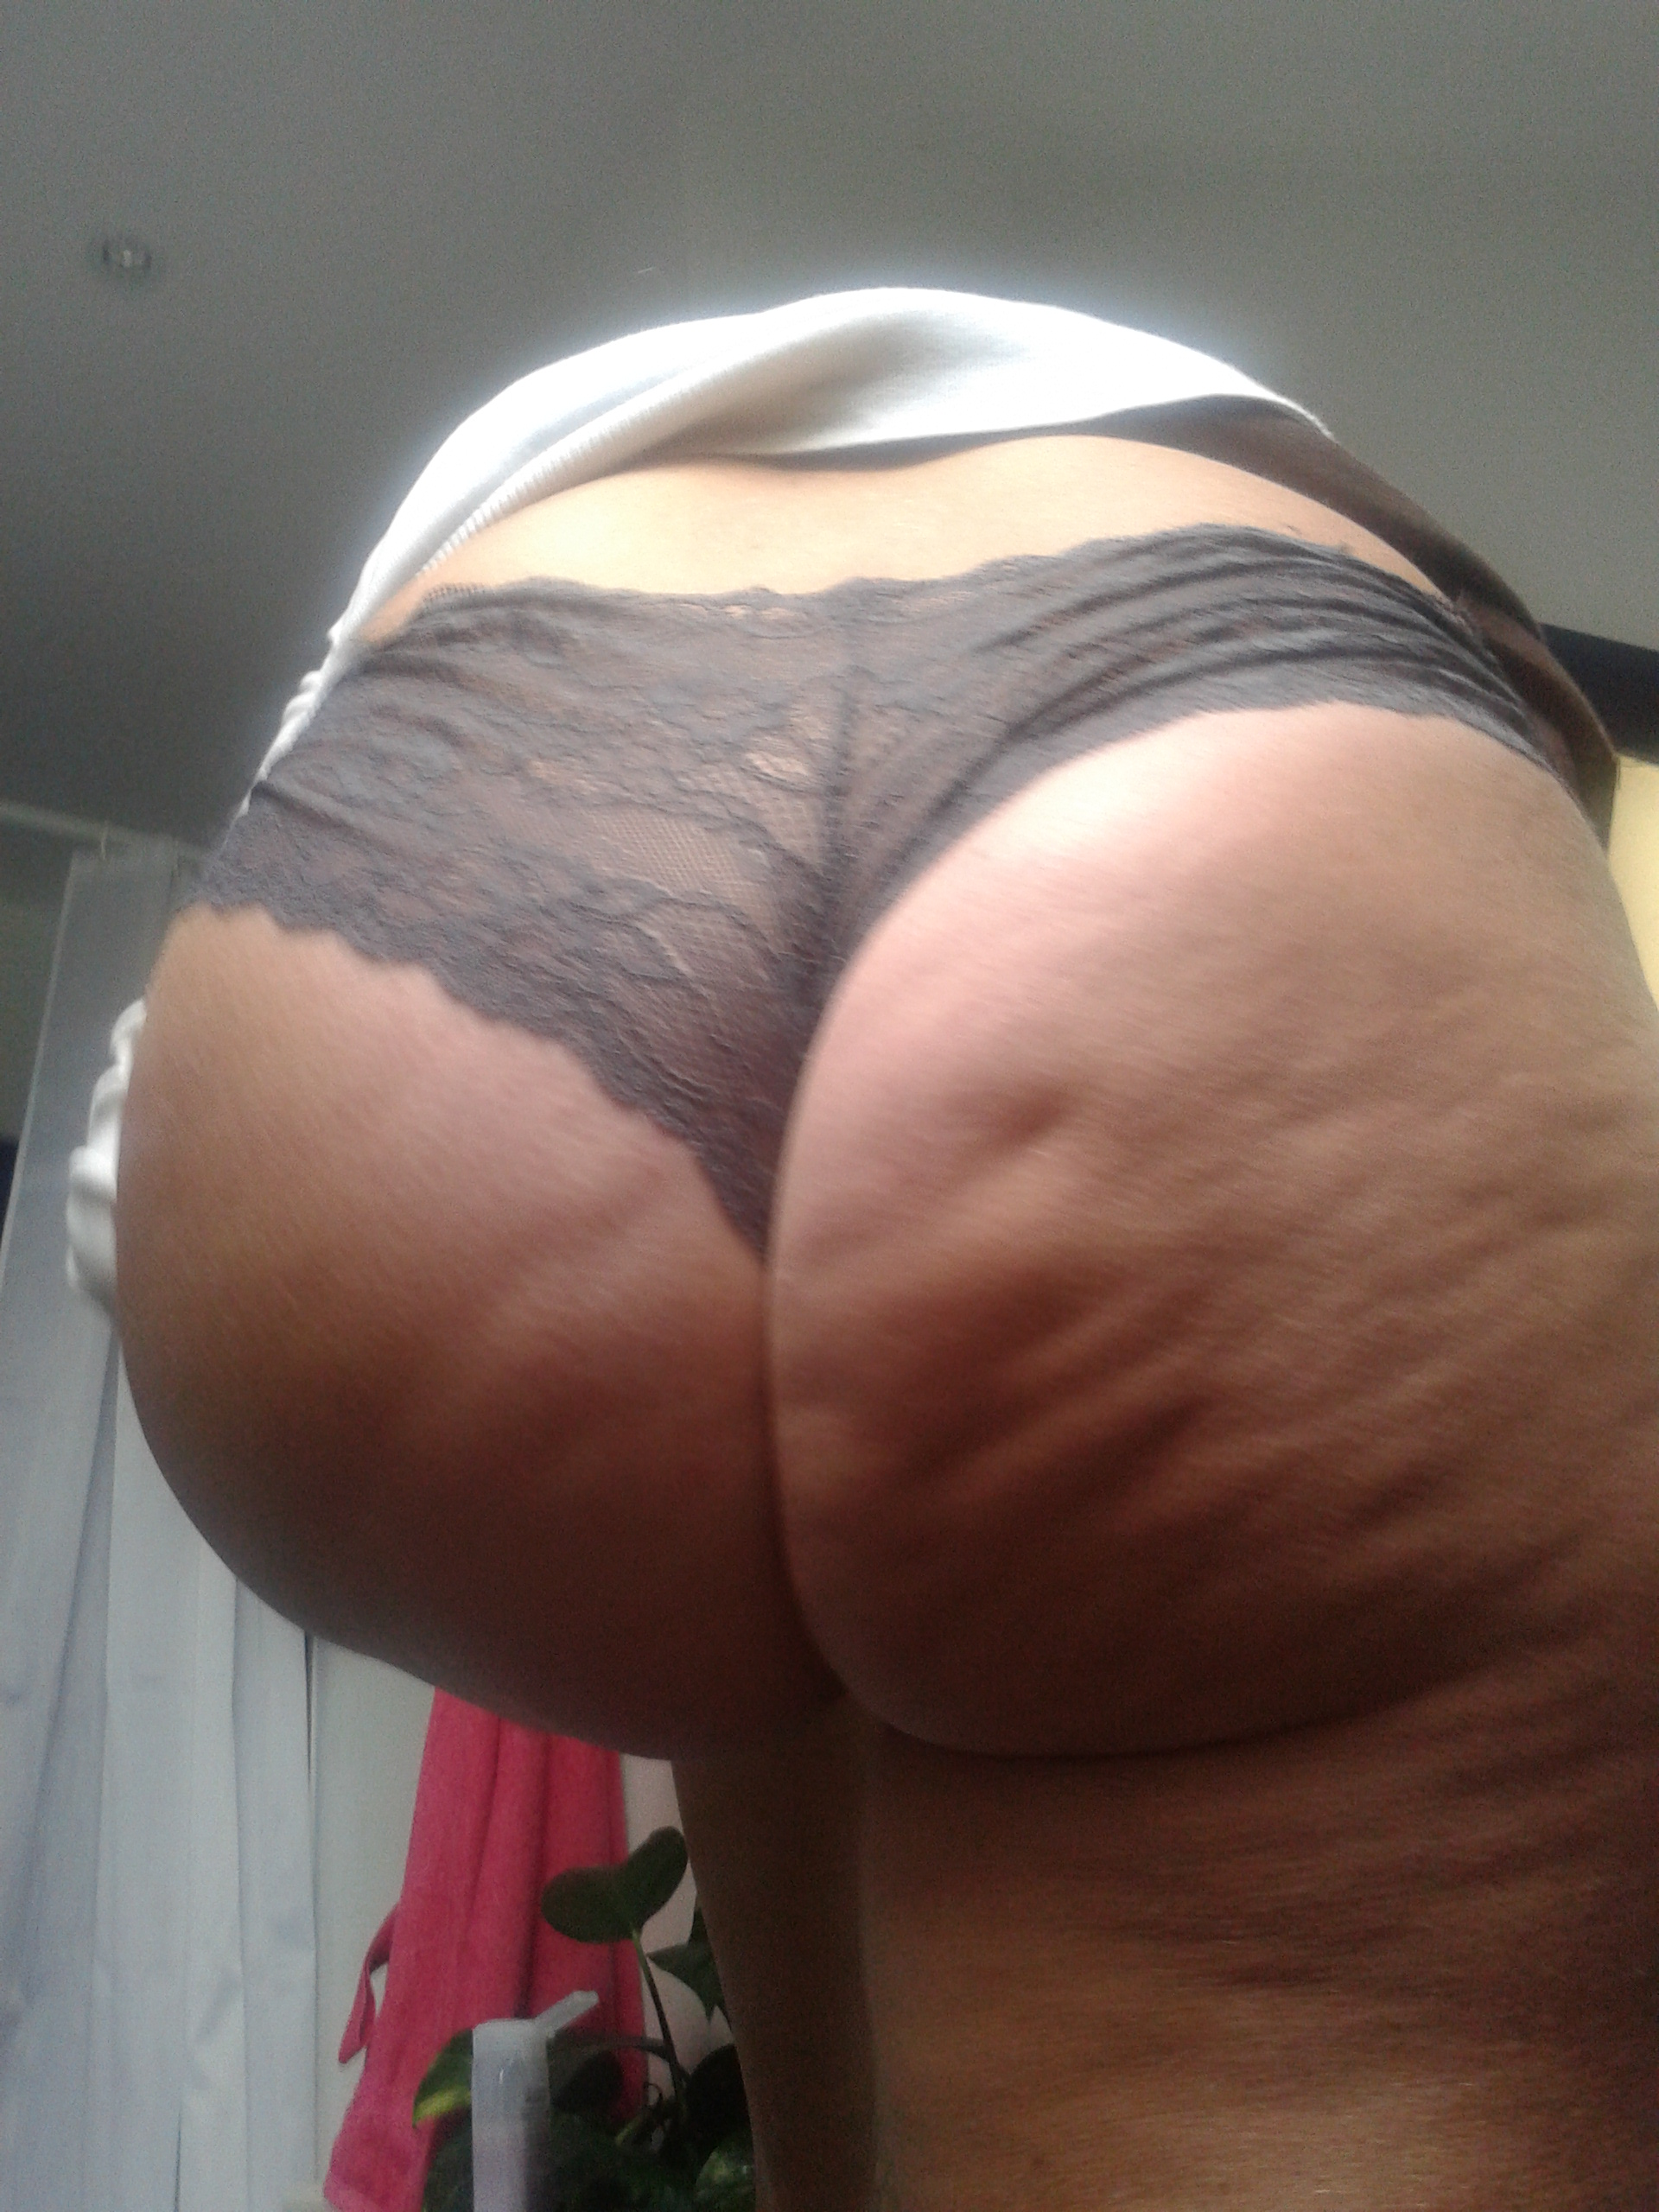 Victoria justice nude pics